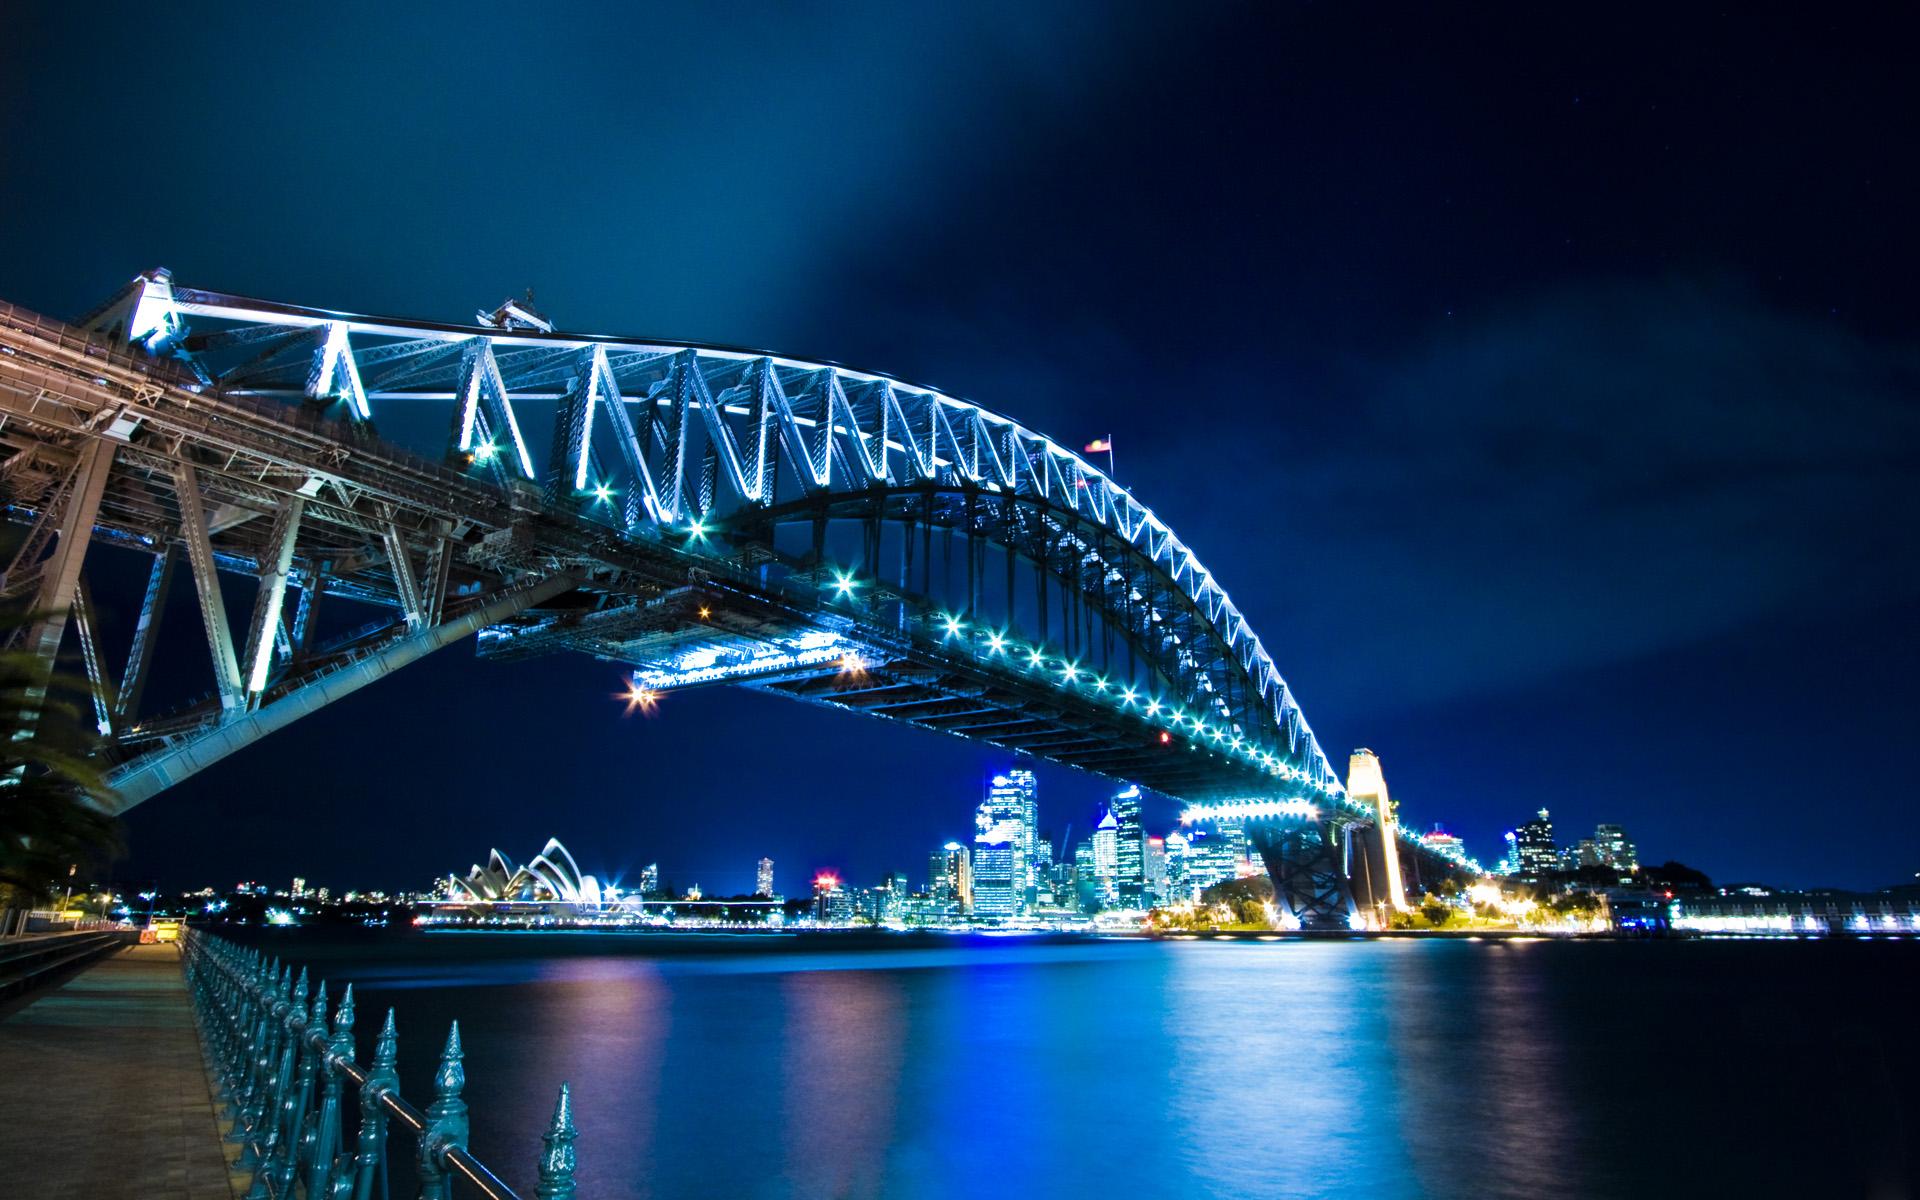 Apple Iphone 5s Wallpaper Hd Download Sydney Harbour Bridge Wallpapers Hd Wallpapers Id 8902